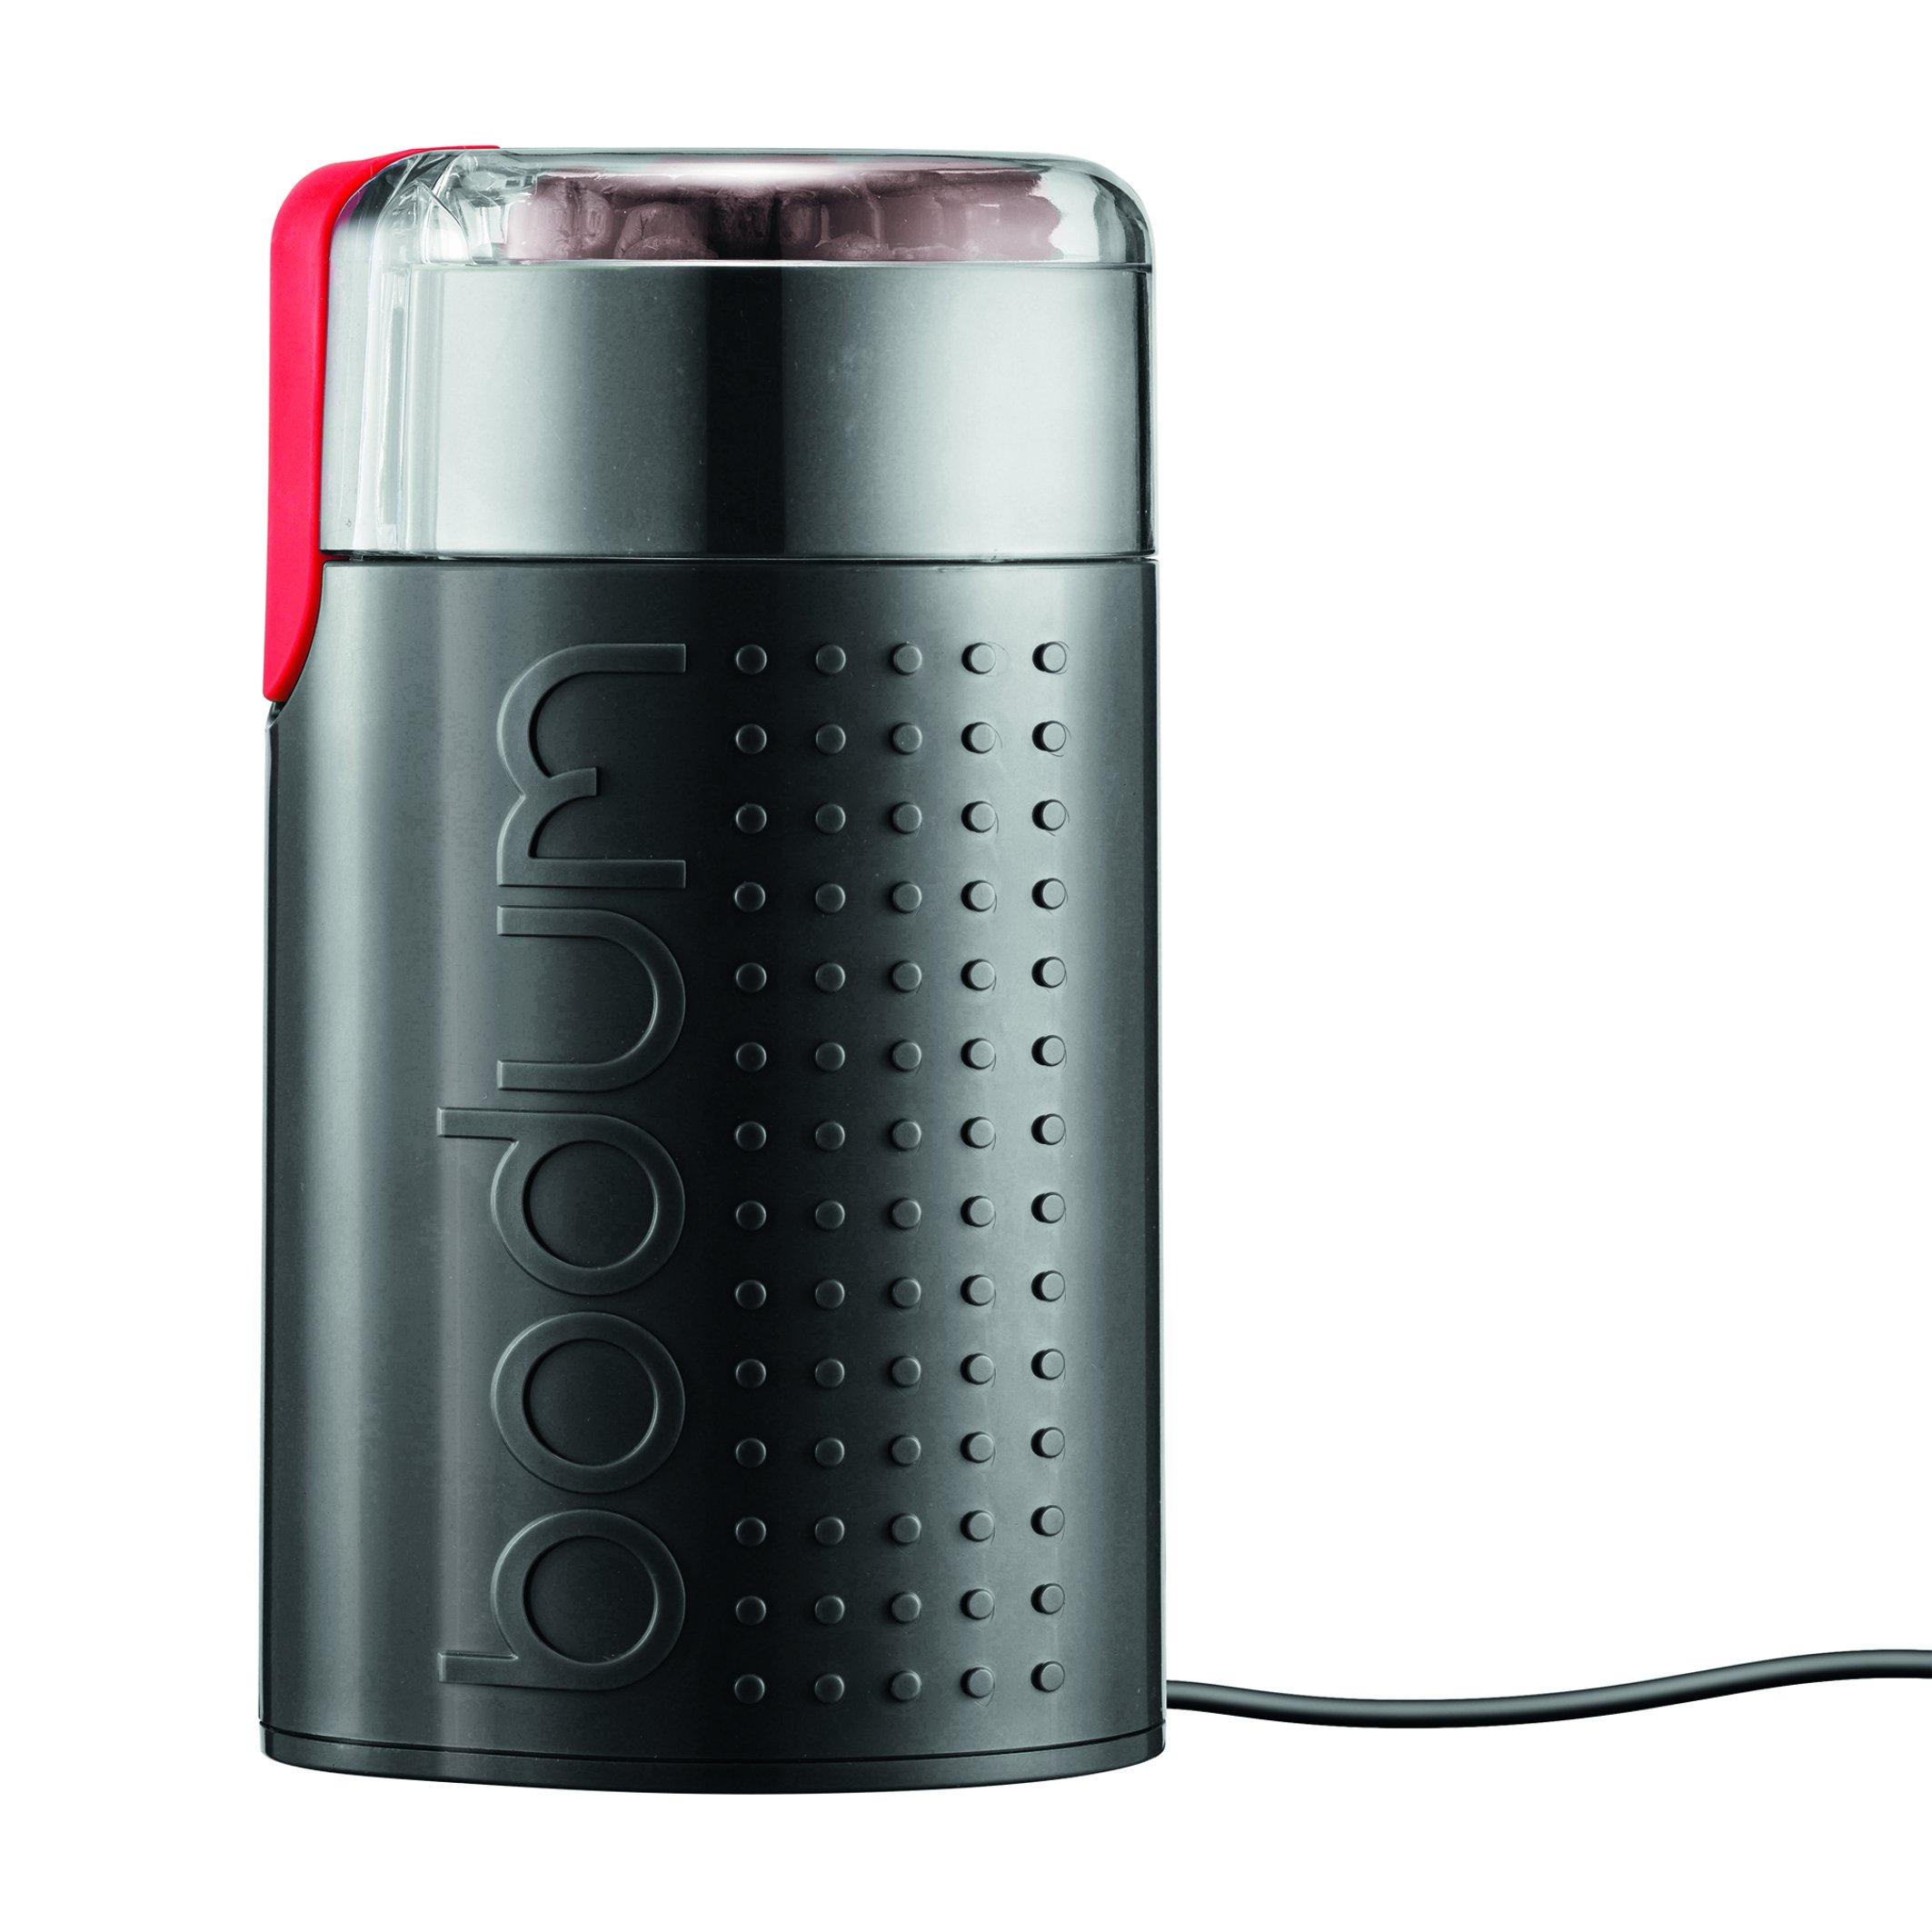 Bodum BISTRO Blade Grinder, Electric Blade Coffee Grinder, Black by Bodum (Image #1)